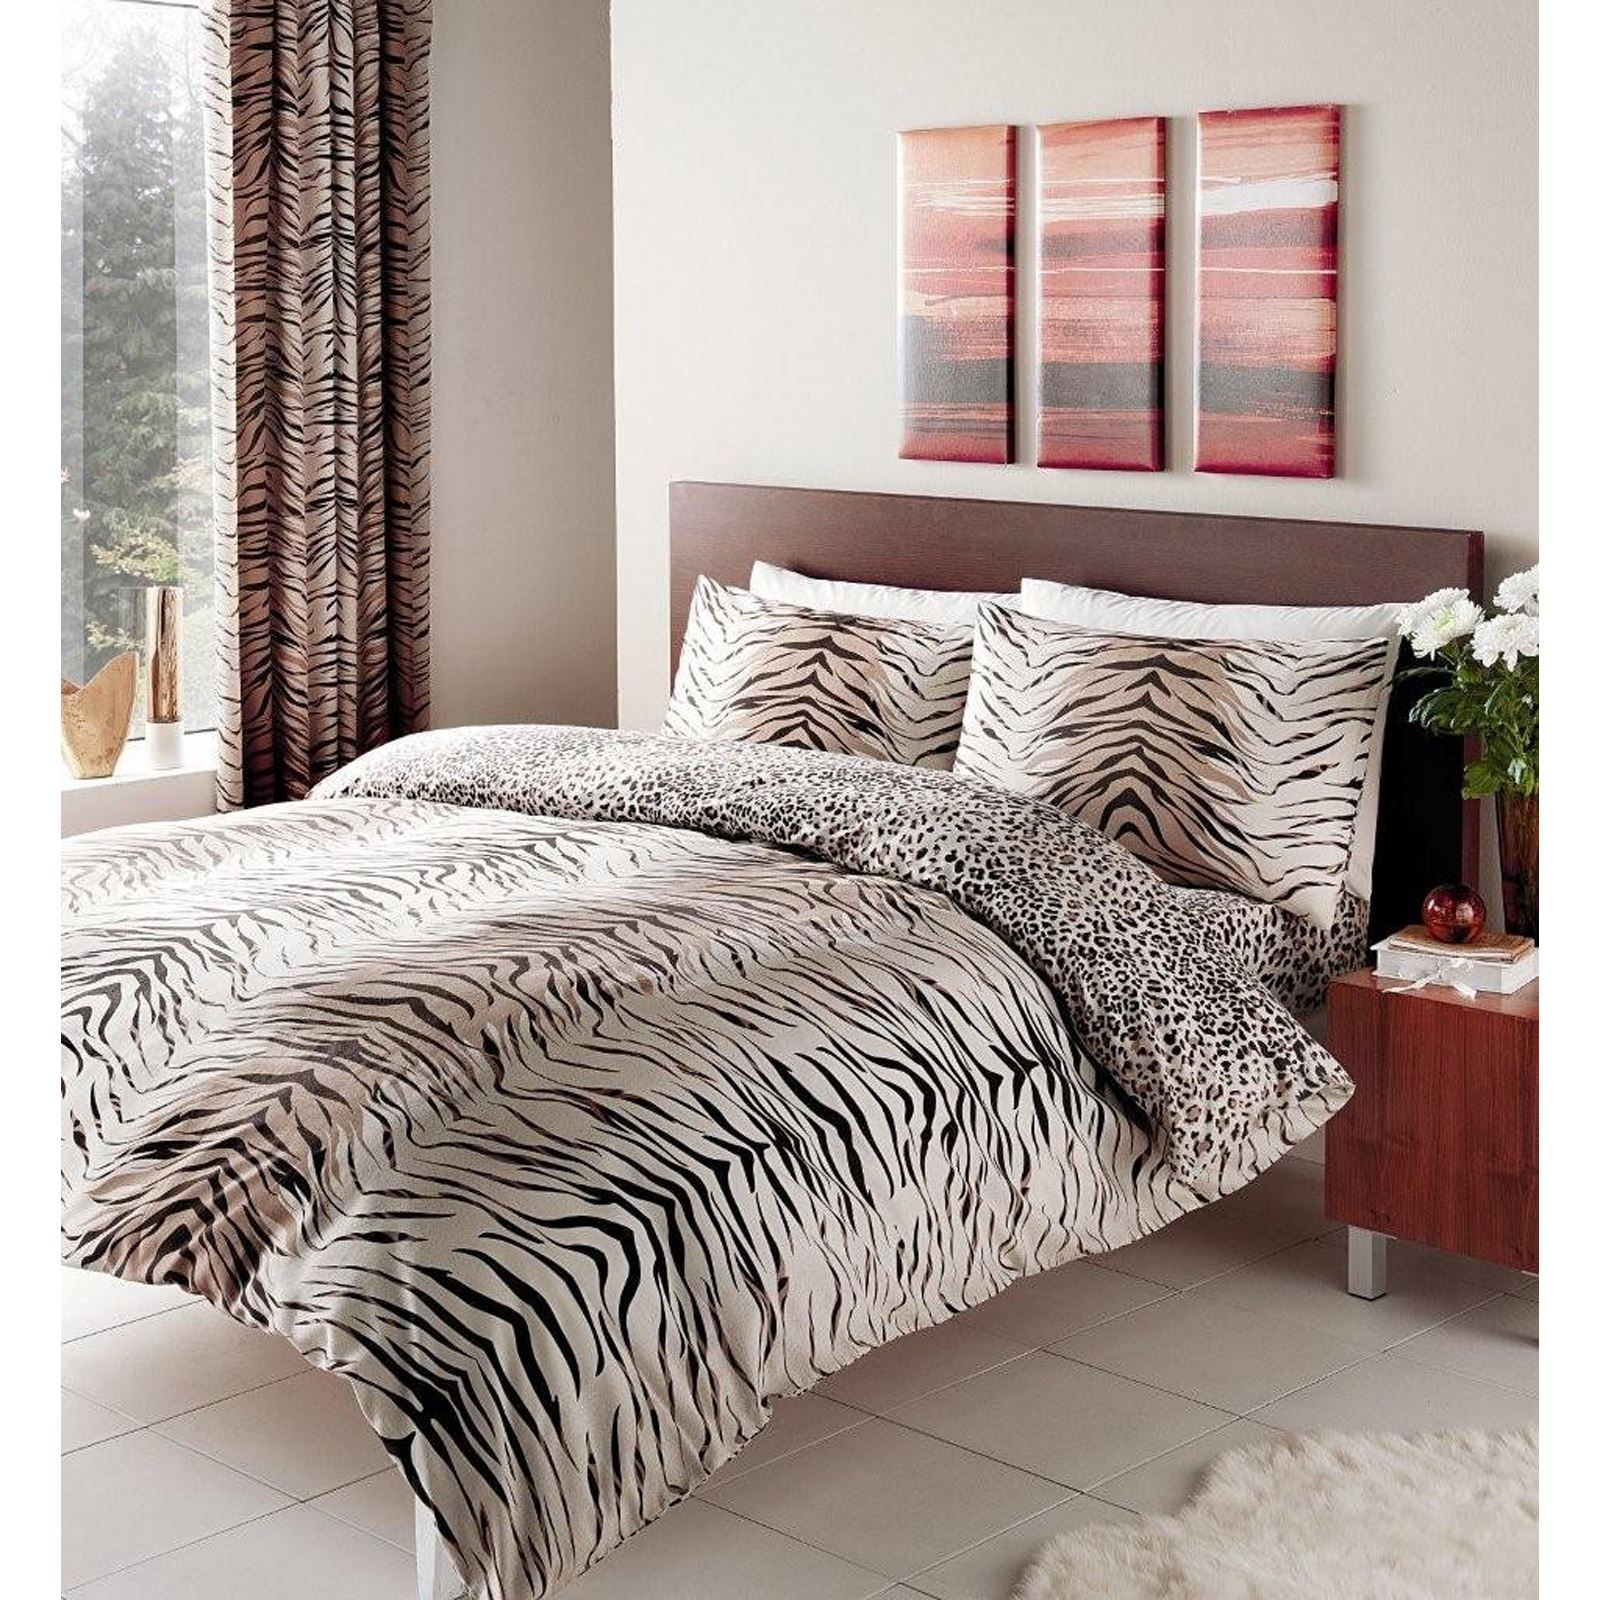 tiger leoparden druck reversible bettw sche sets in einzel doppel king size ebay. Black Bedroom Furniture Sets. Home Design Ideas